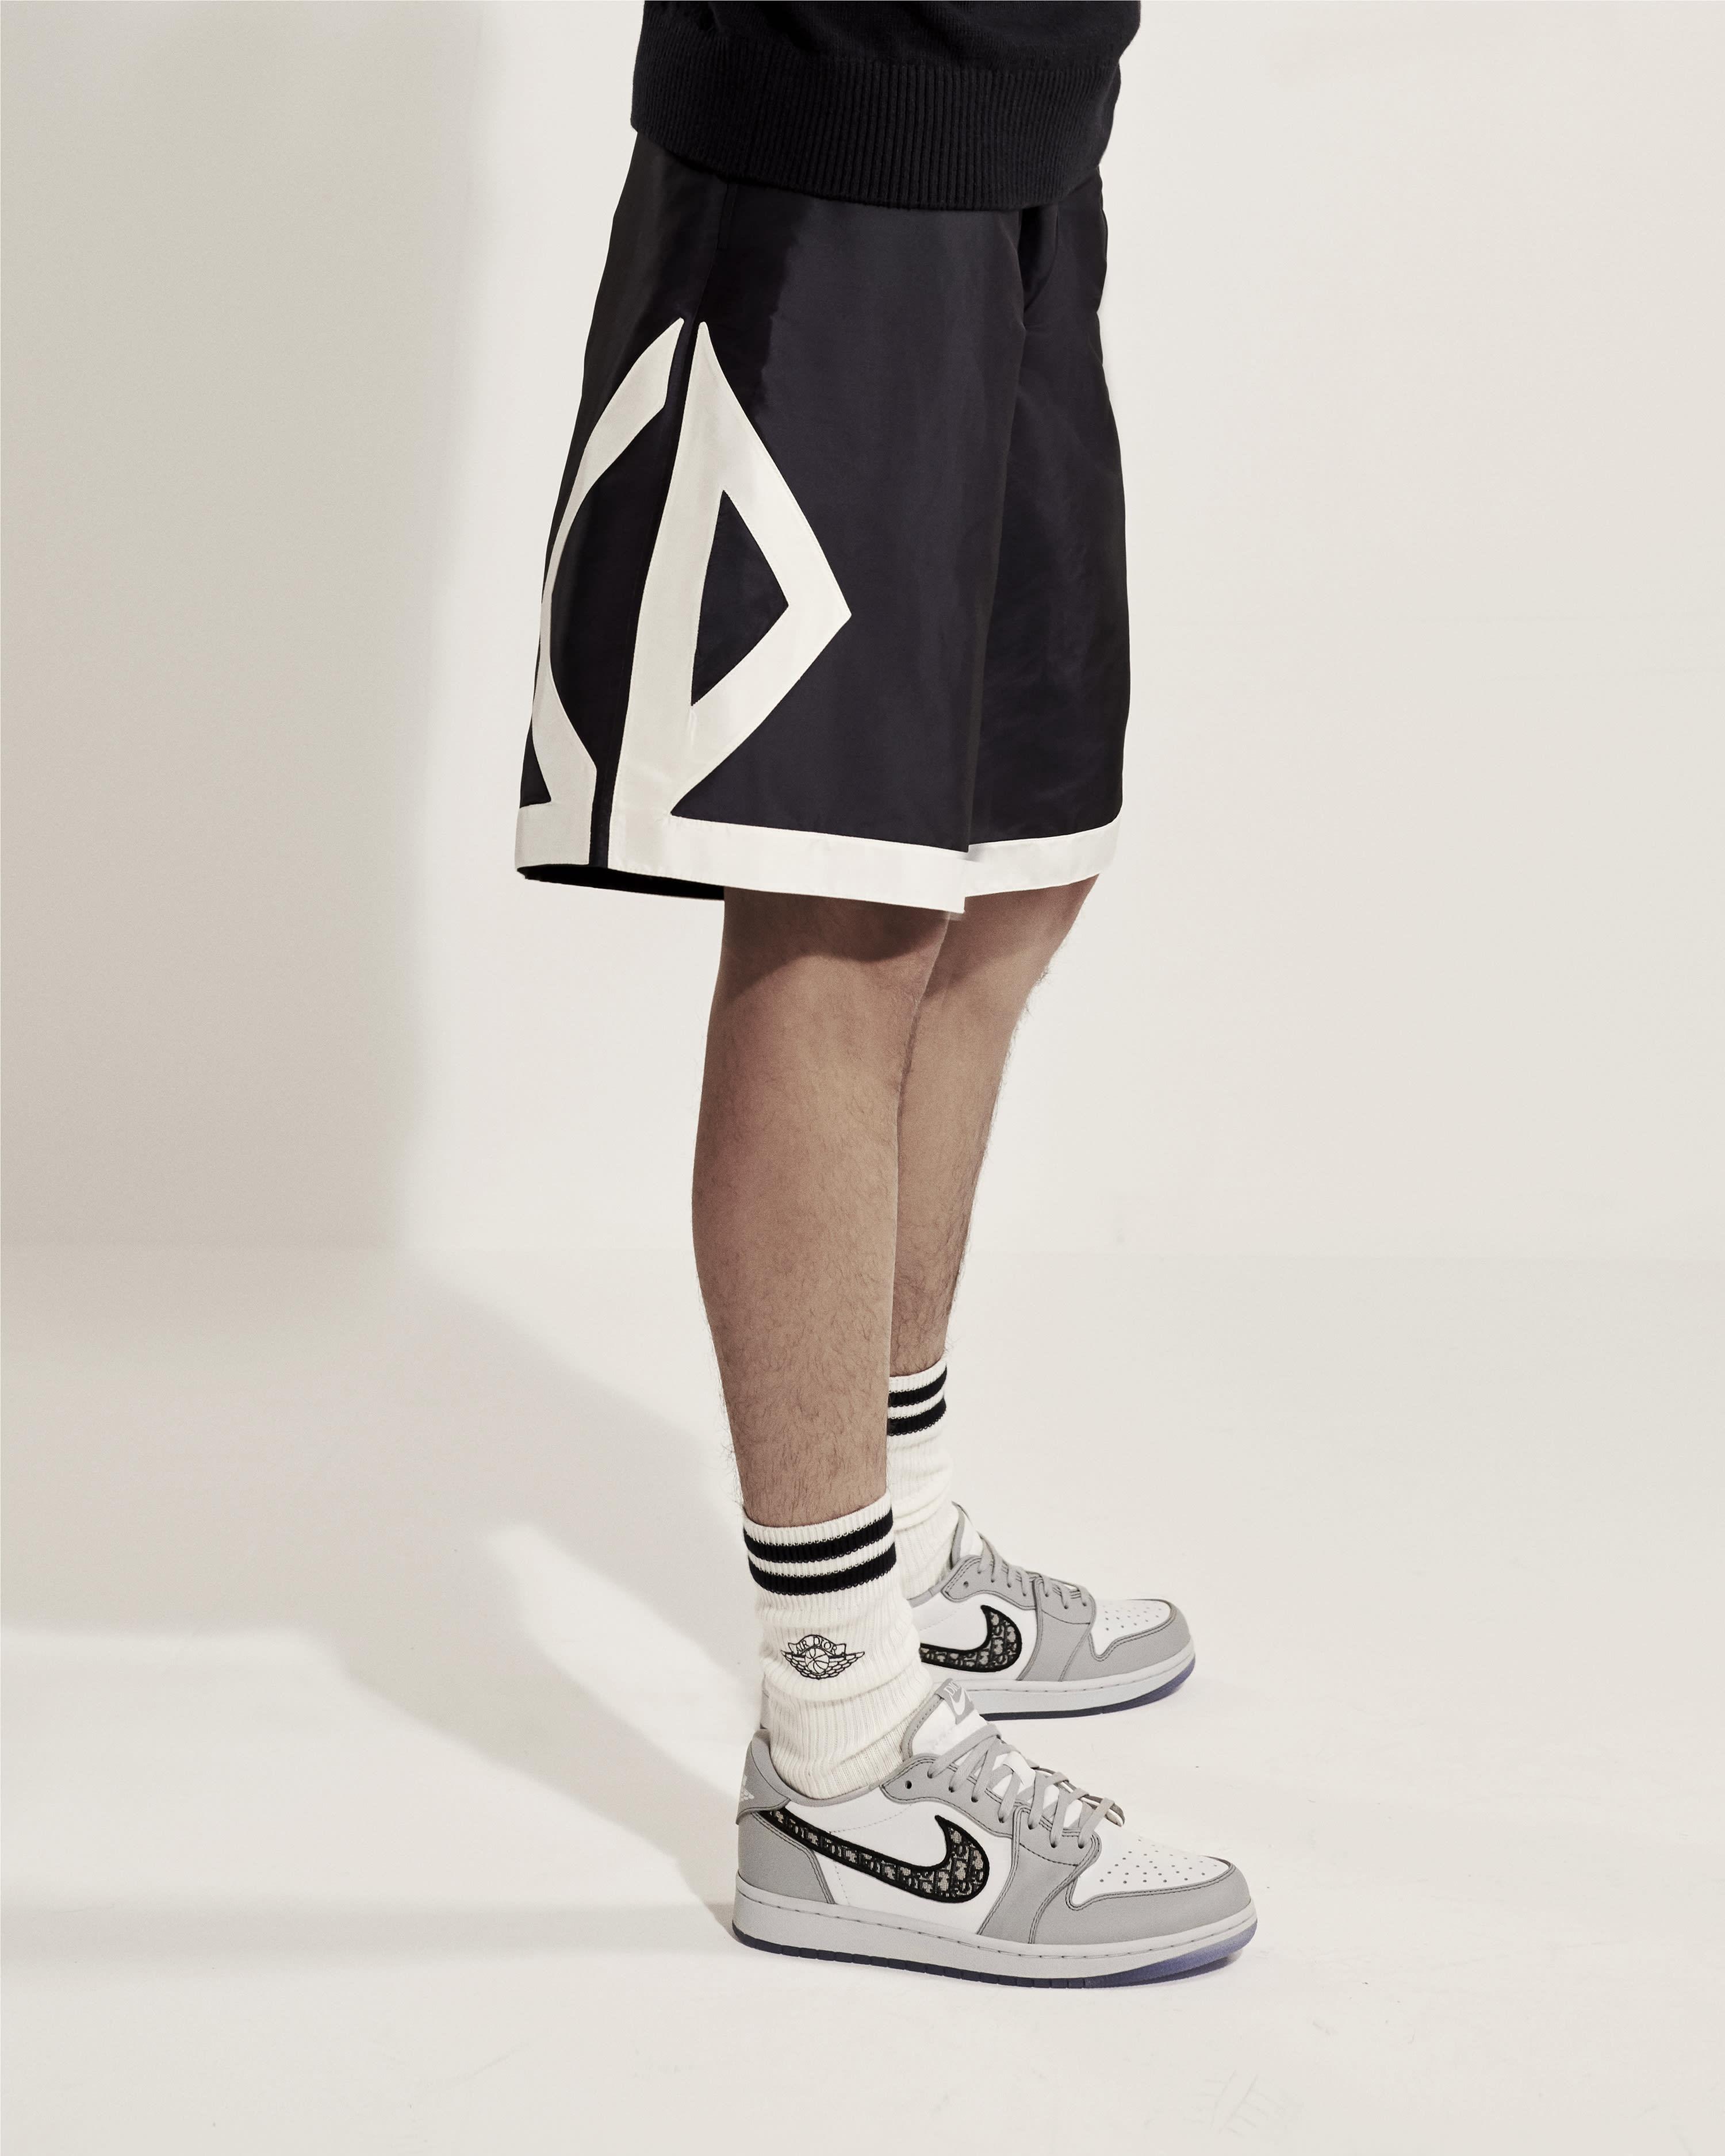 Where To Buy Dior Air Jordan 1s Complex